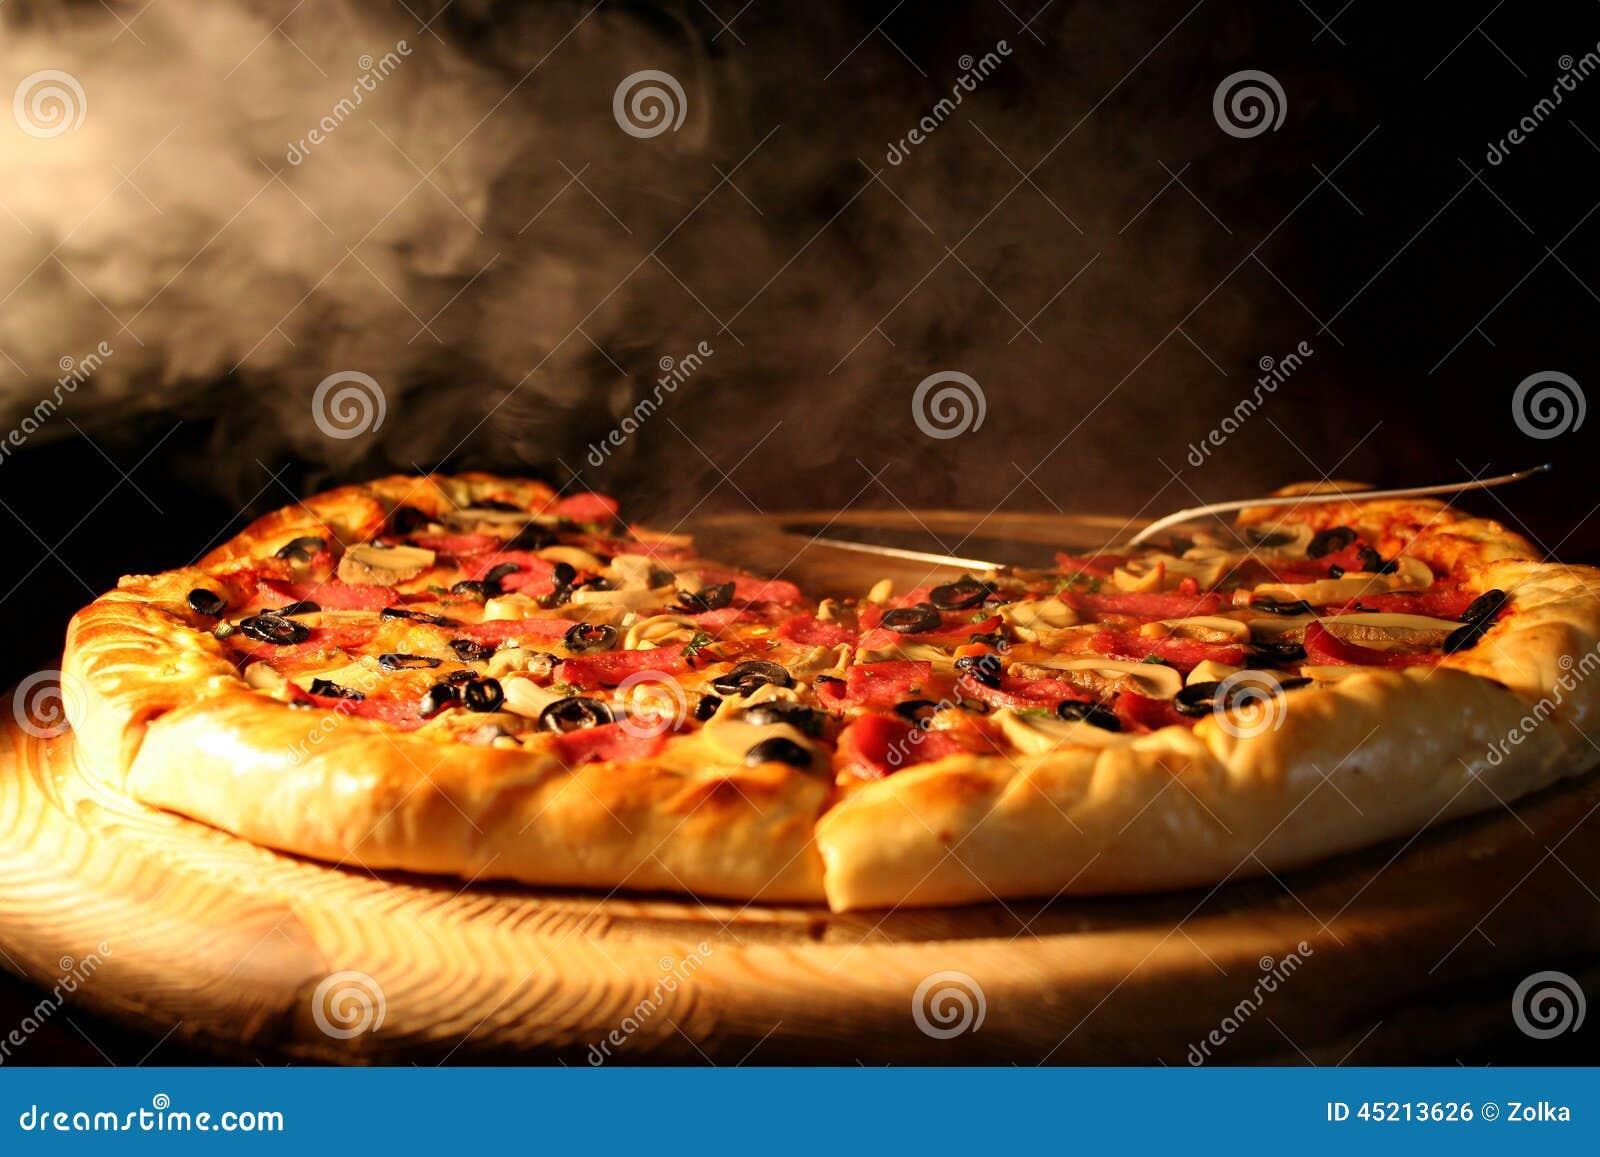 hot pizza stock photo image 45213626. Black Bedroom Furniture Sets. Home Design Ideas